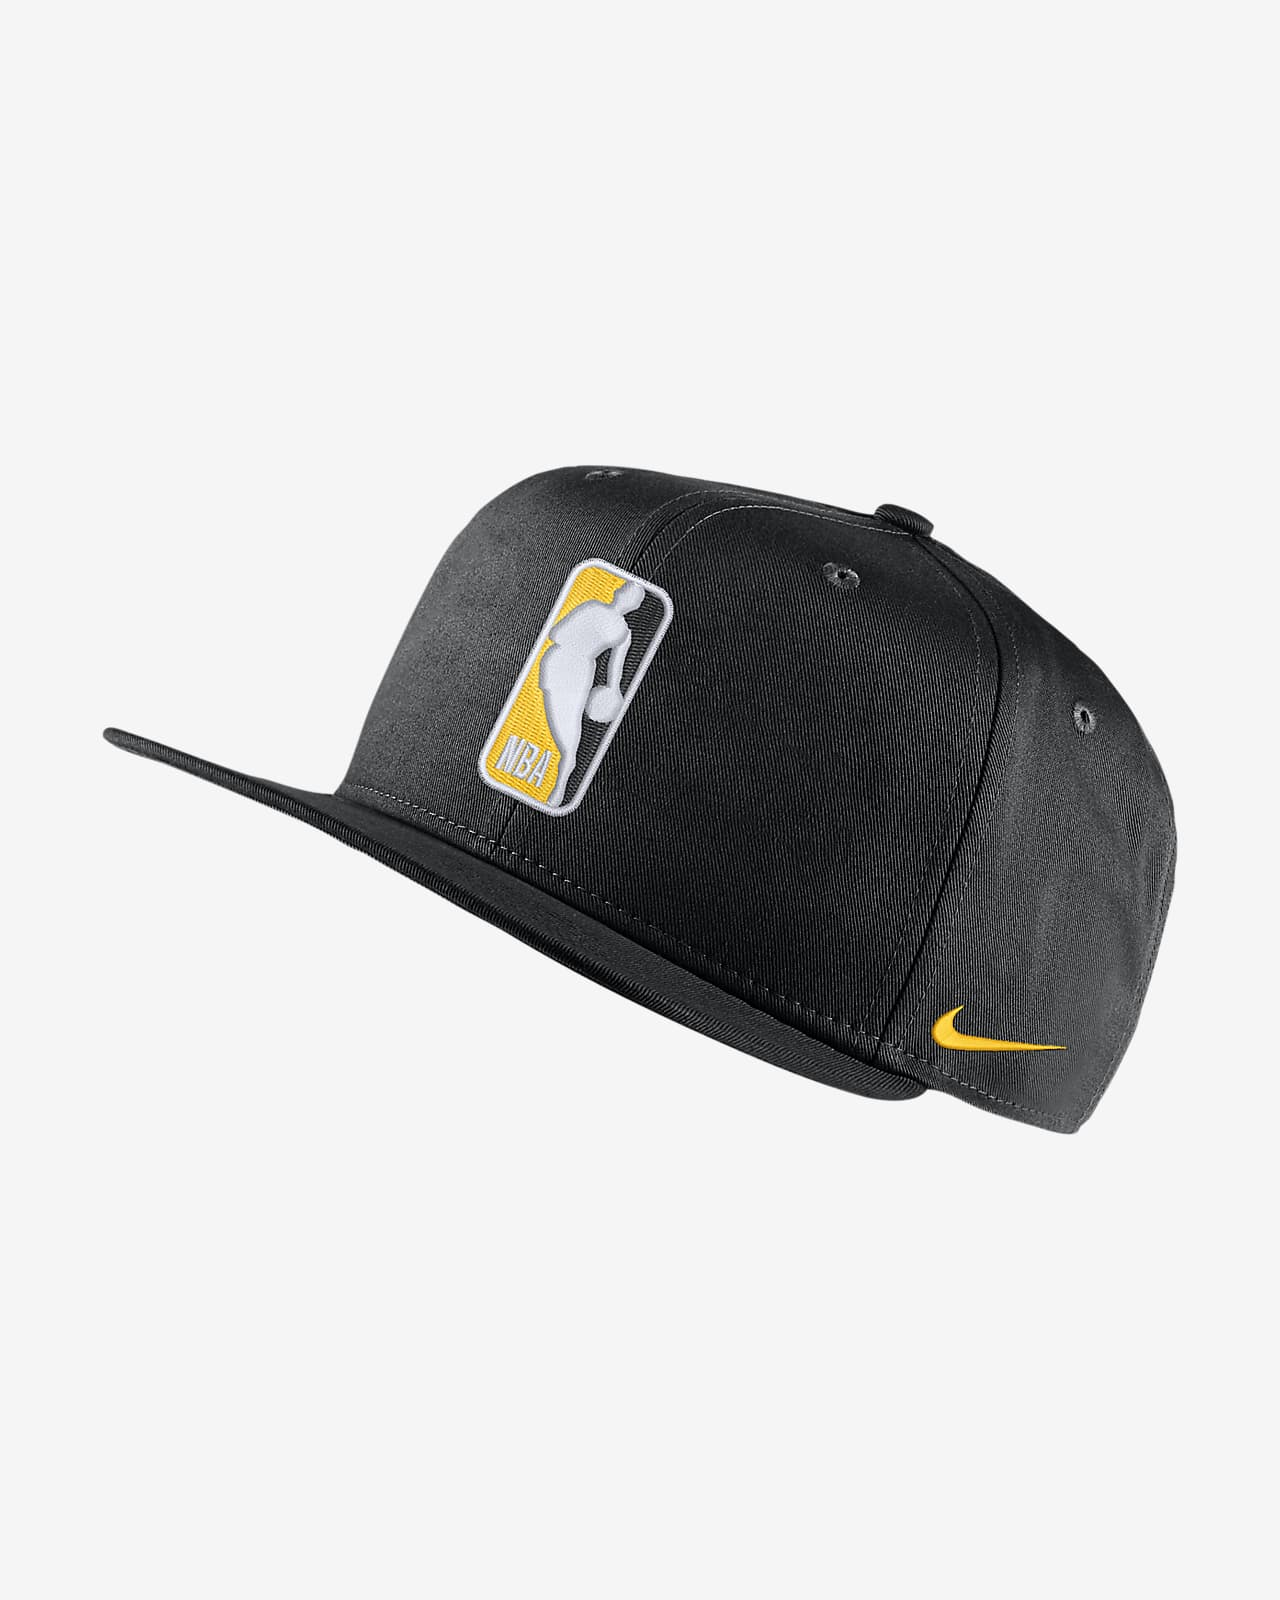 Casquette réglable NBA Nike Pro Team 31 Logo